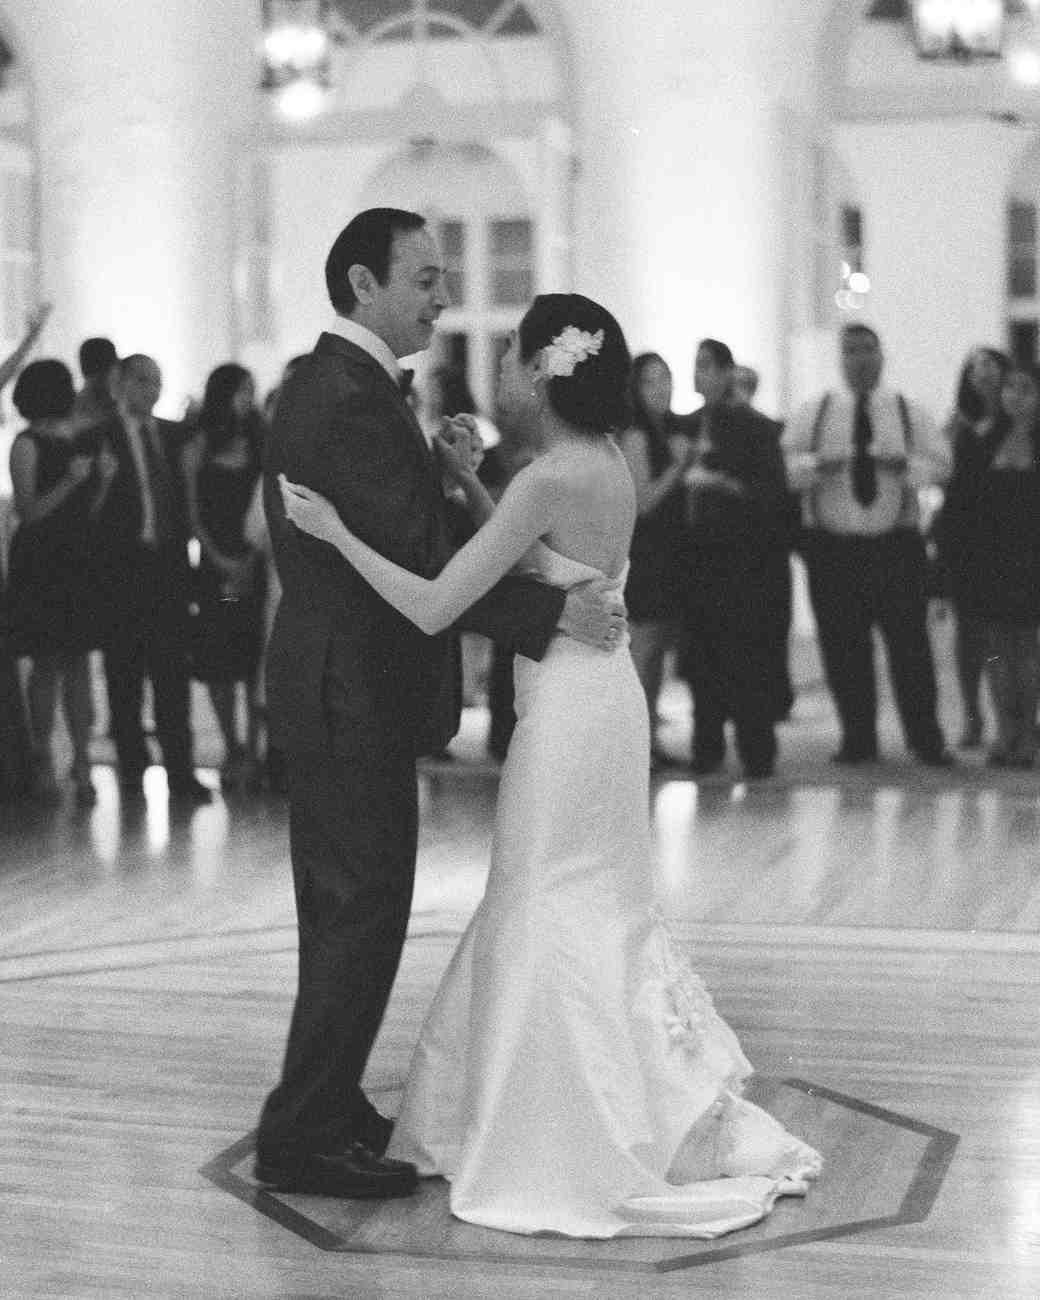 marianne-ian-wedding-dance-0414.jpg